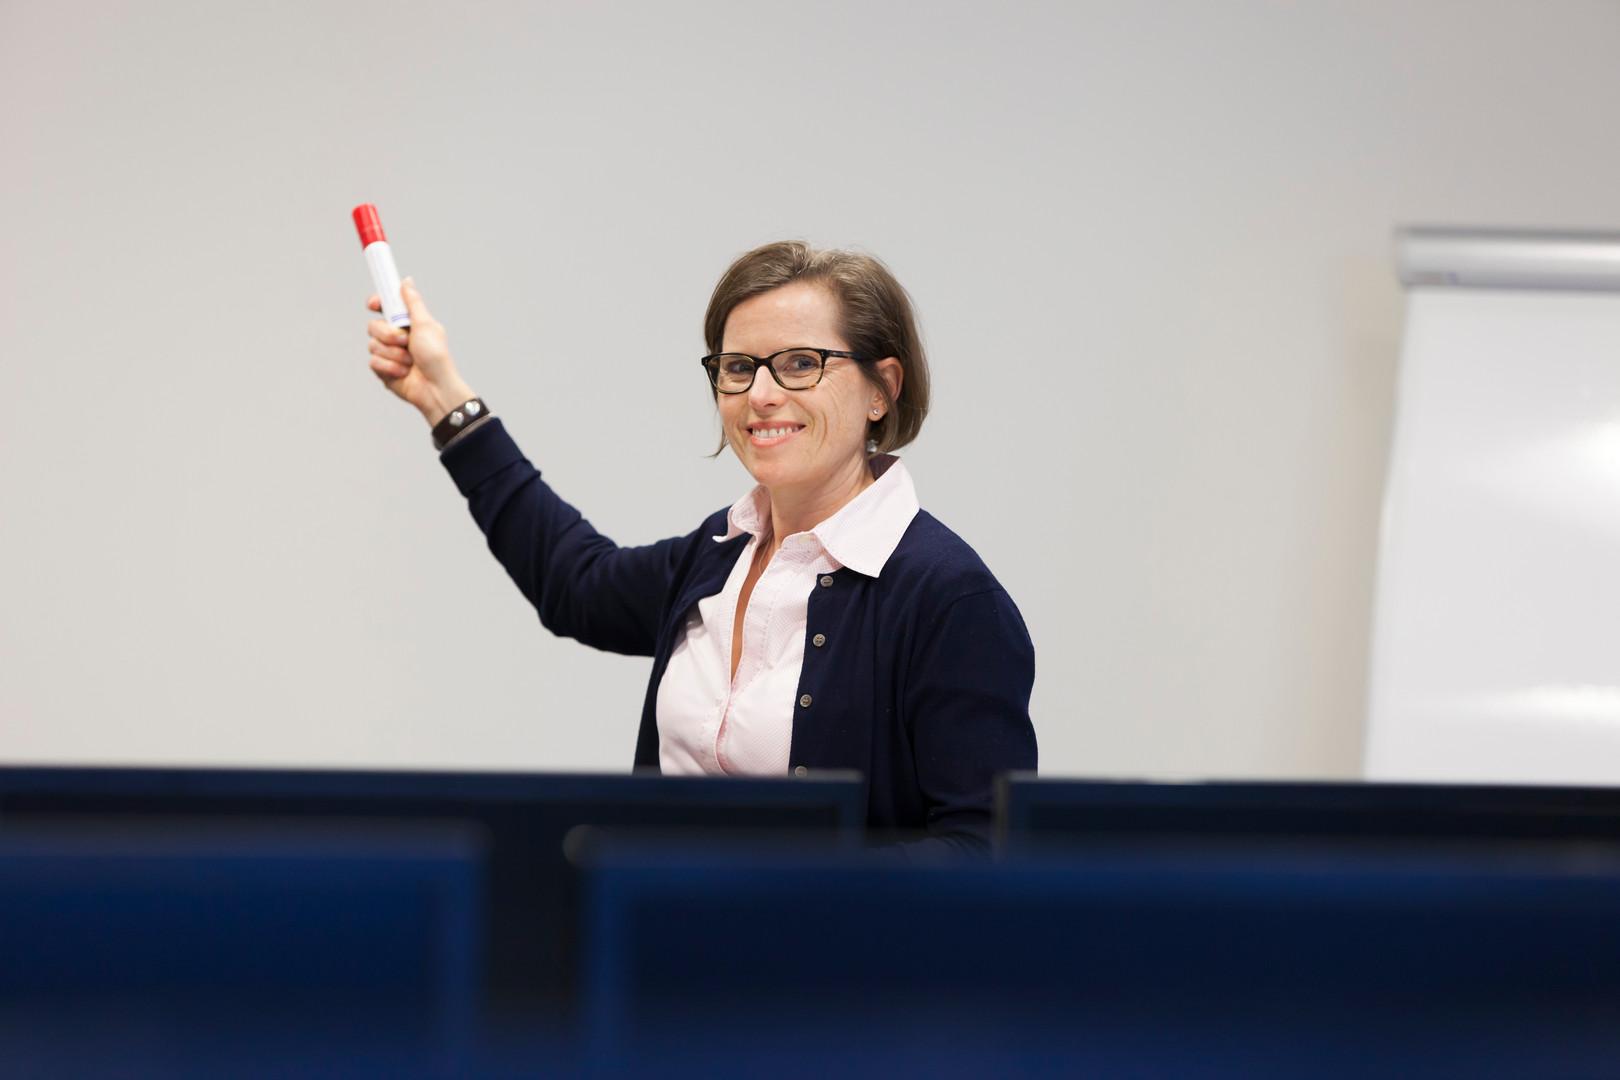 Anette Kielholz